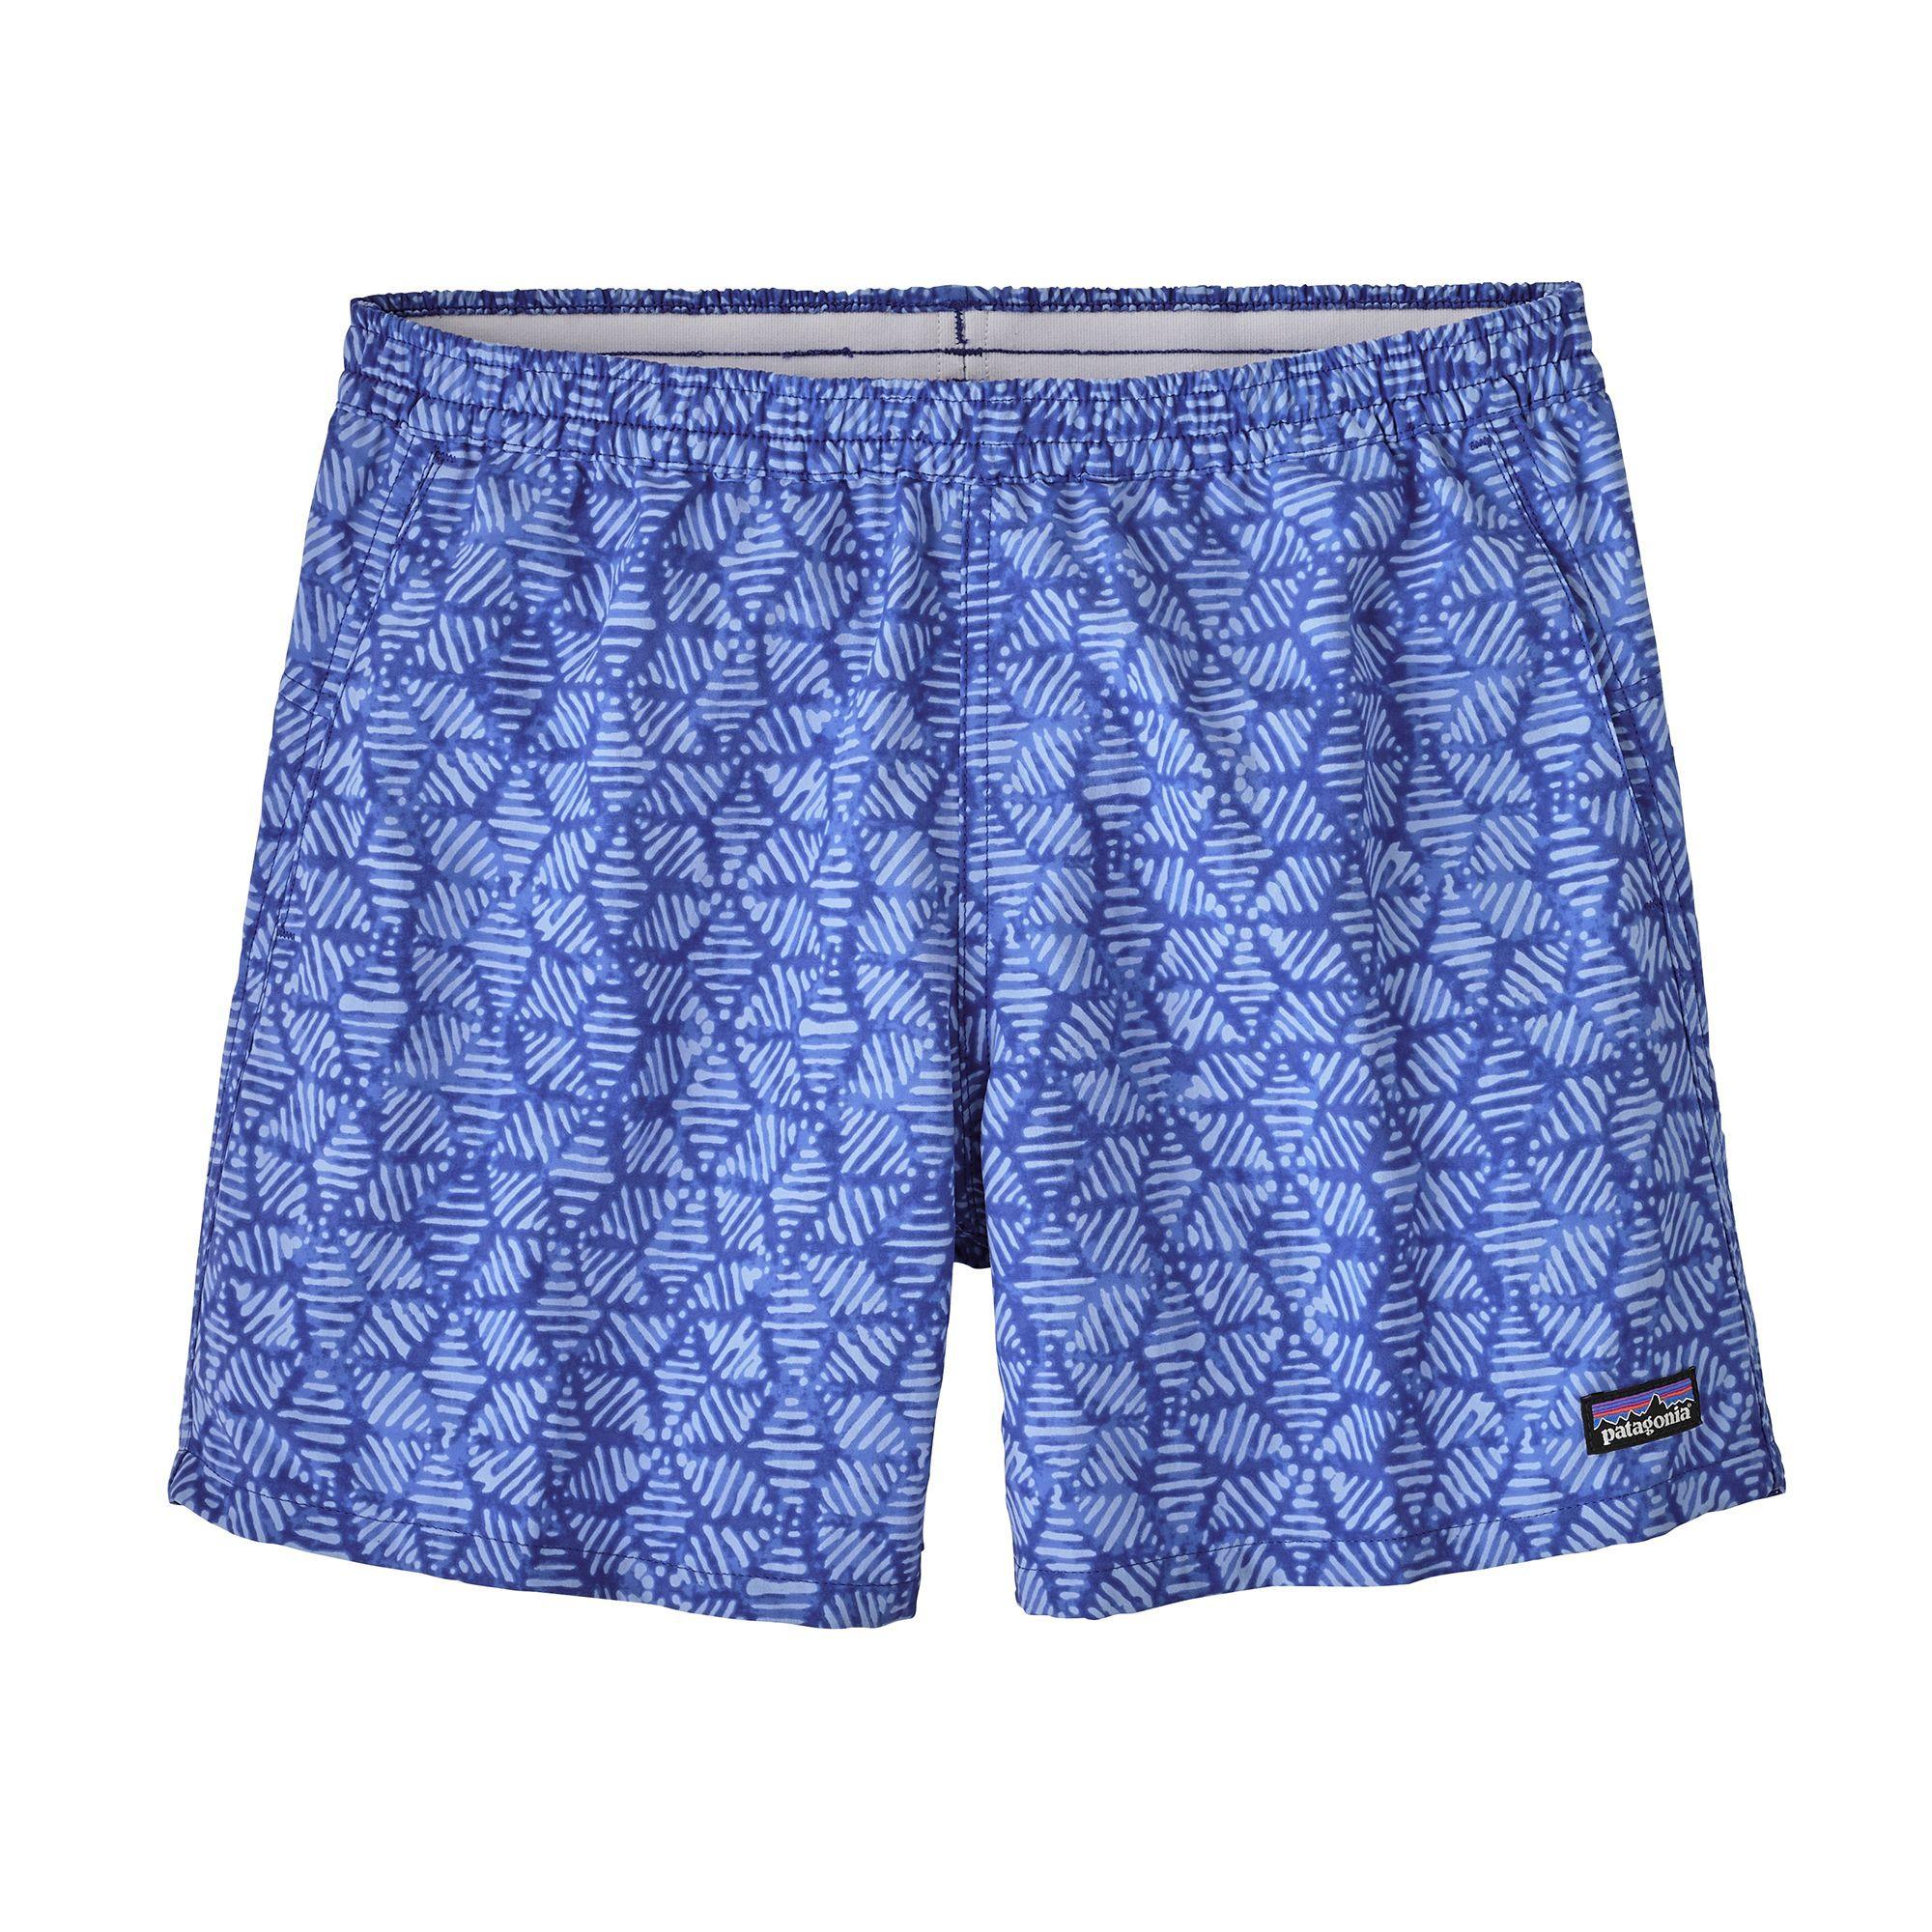 e7d81e6d4d W's Baggies™ Shorts - 5